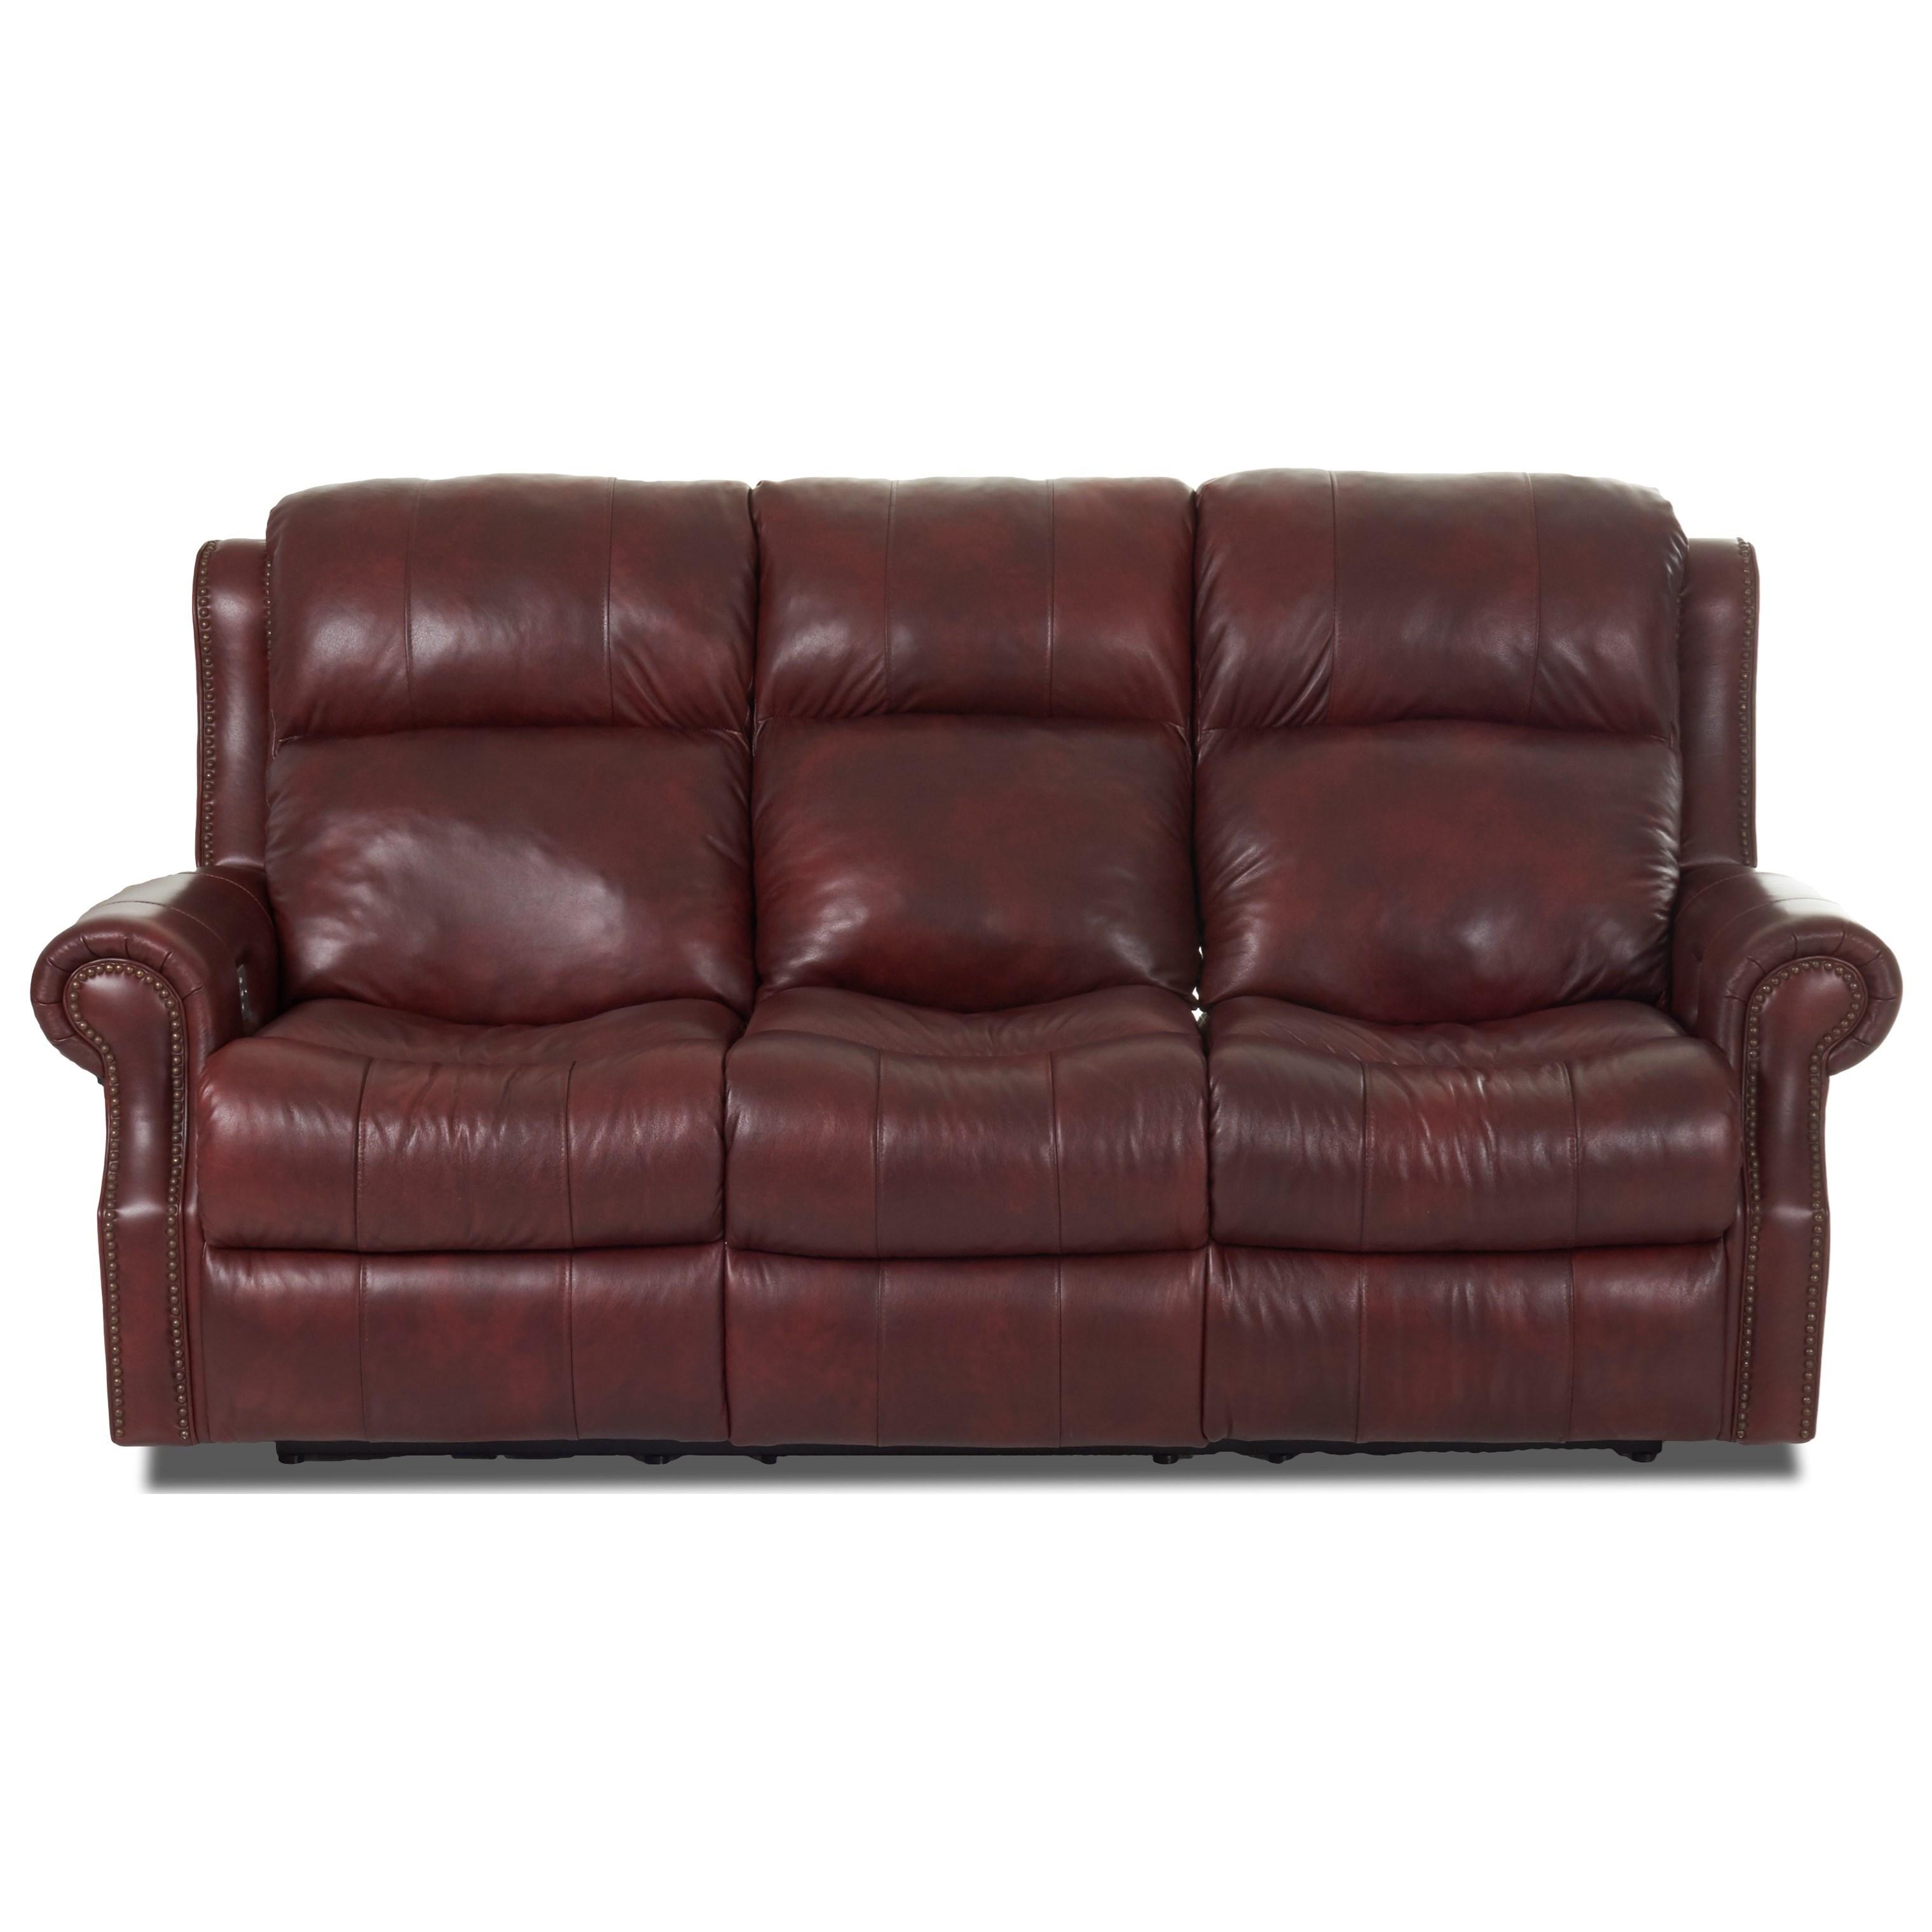 Vivio Reclining Sofa by Klaussner at Johnny Janosik